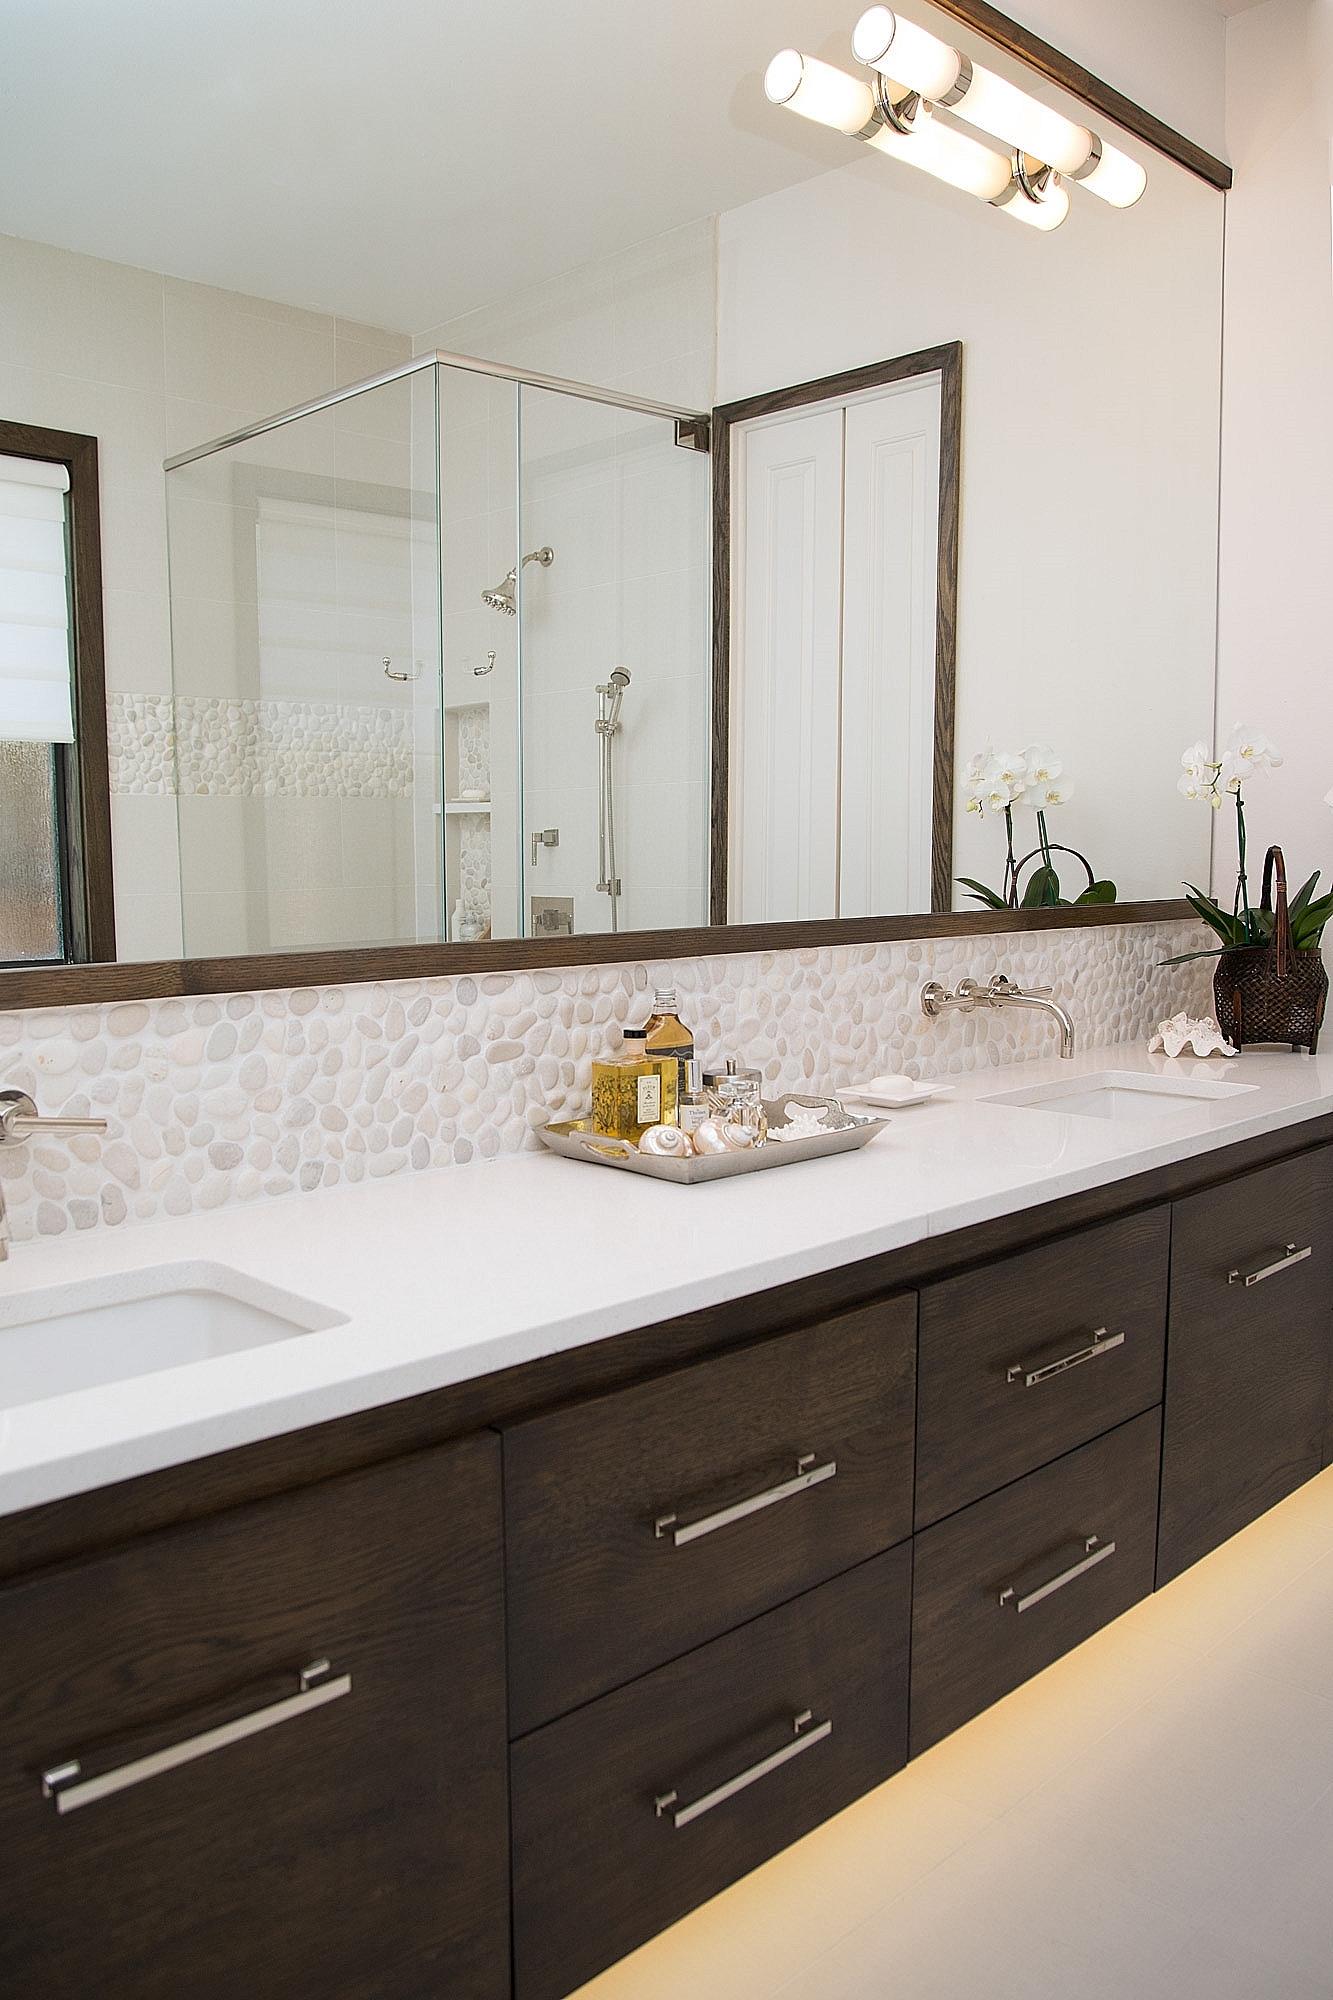 Master Bath Remodel - floating cabinetry, pebble tile backsplash, wall mount faucets